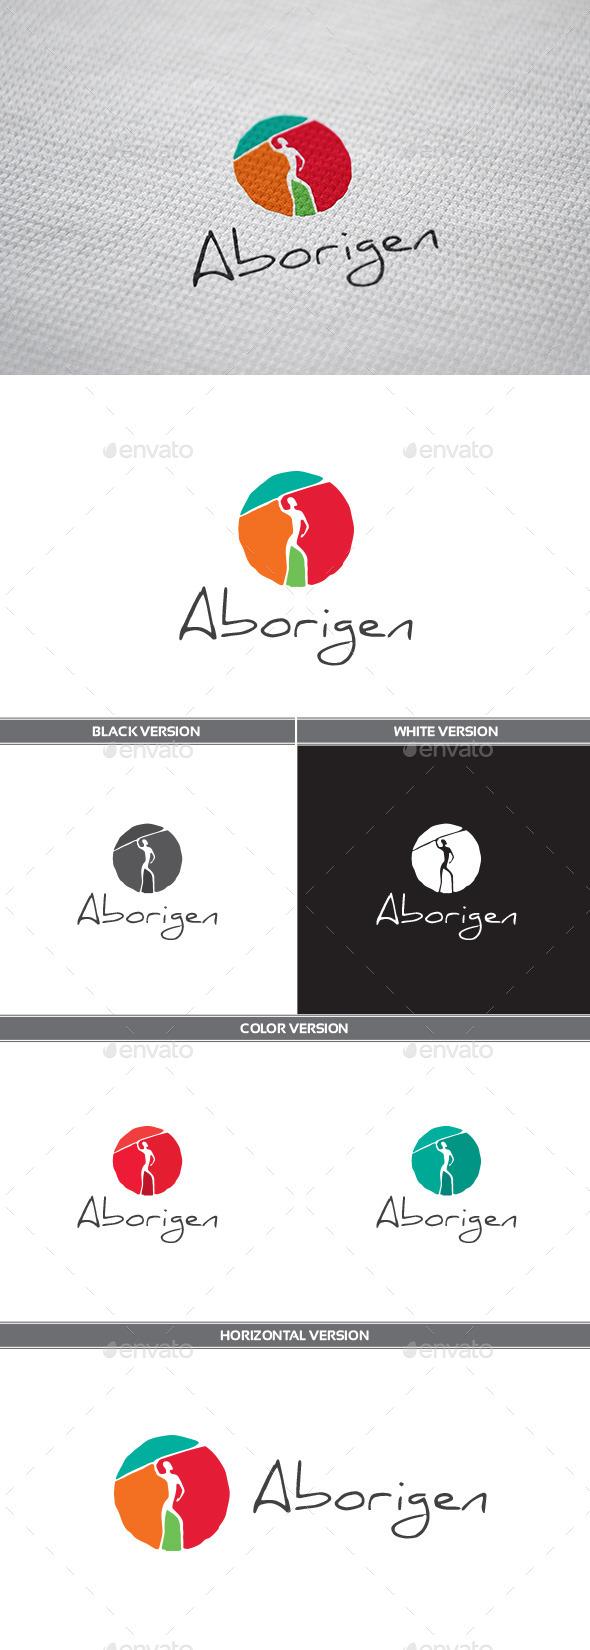 GraphicRiver Aborigen Logo 11031507